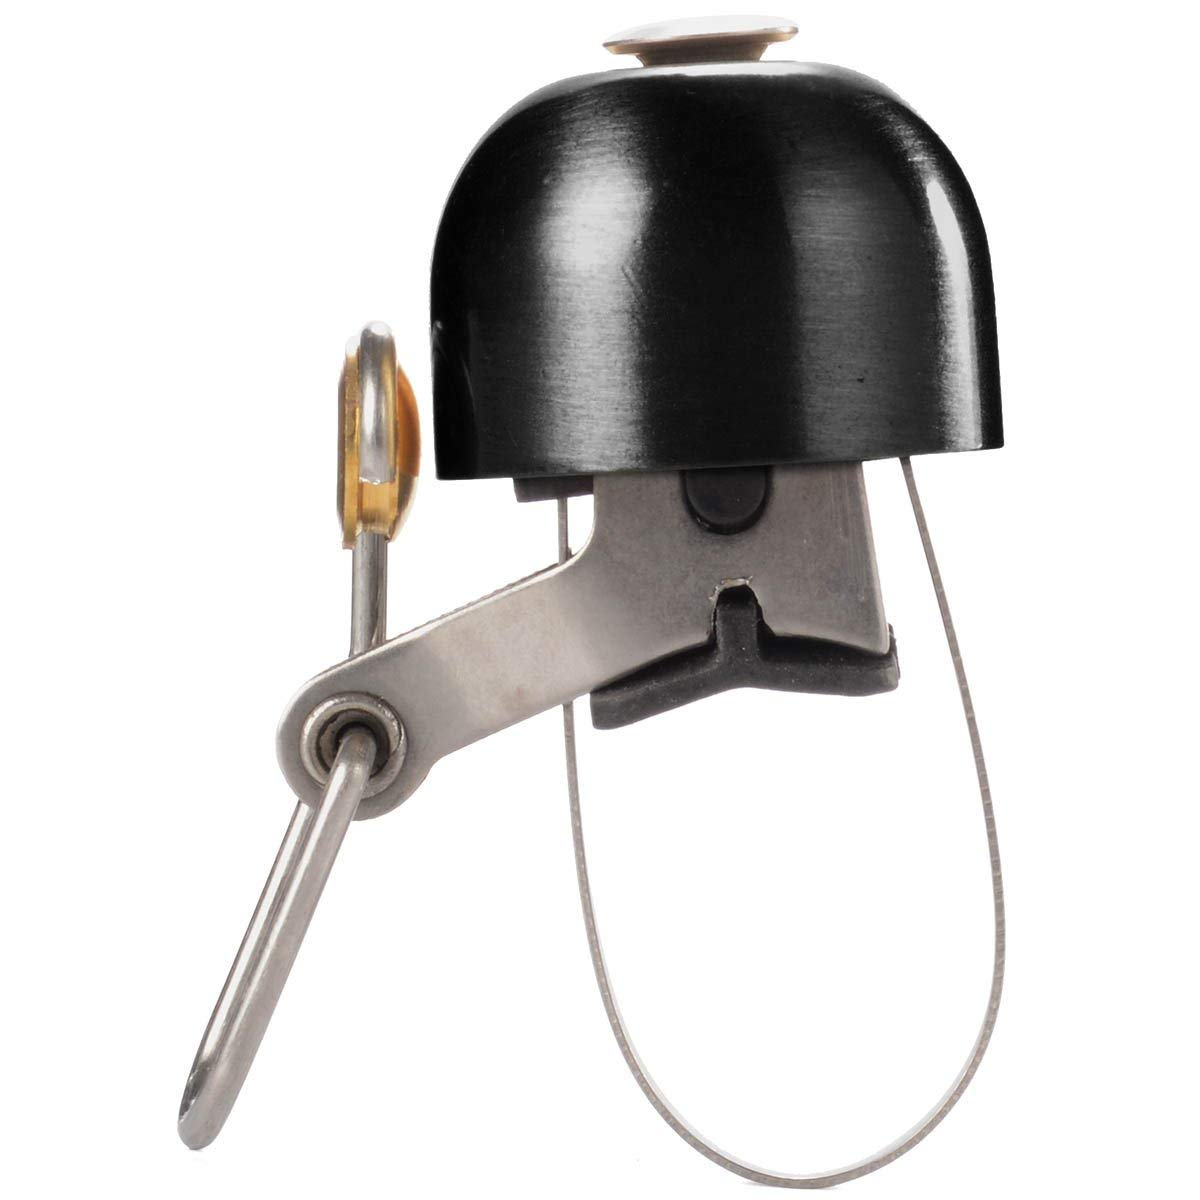 WANDERVOGEL Bike Bell Ring Retro Style Black